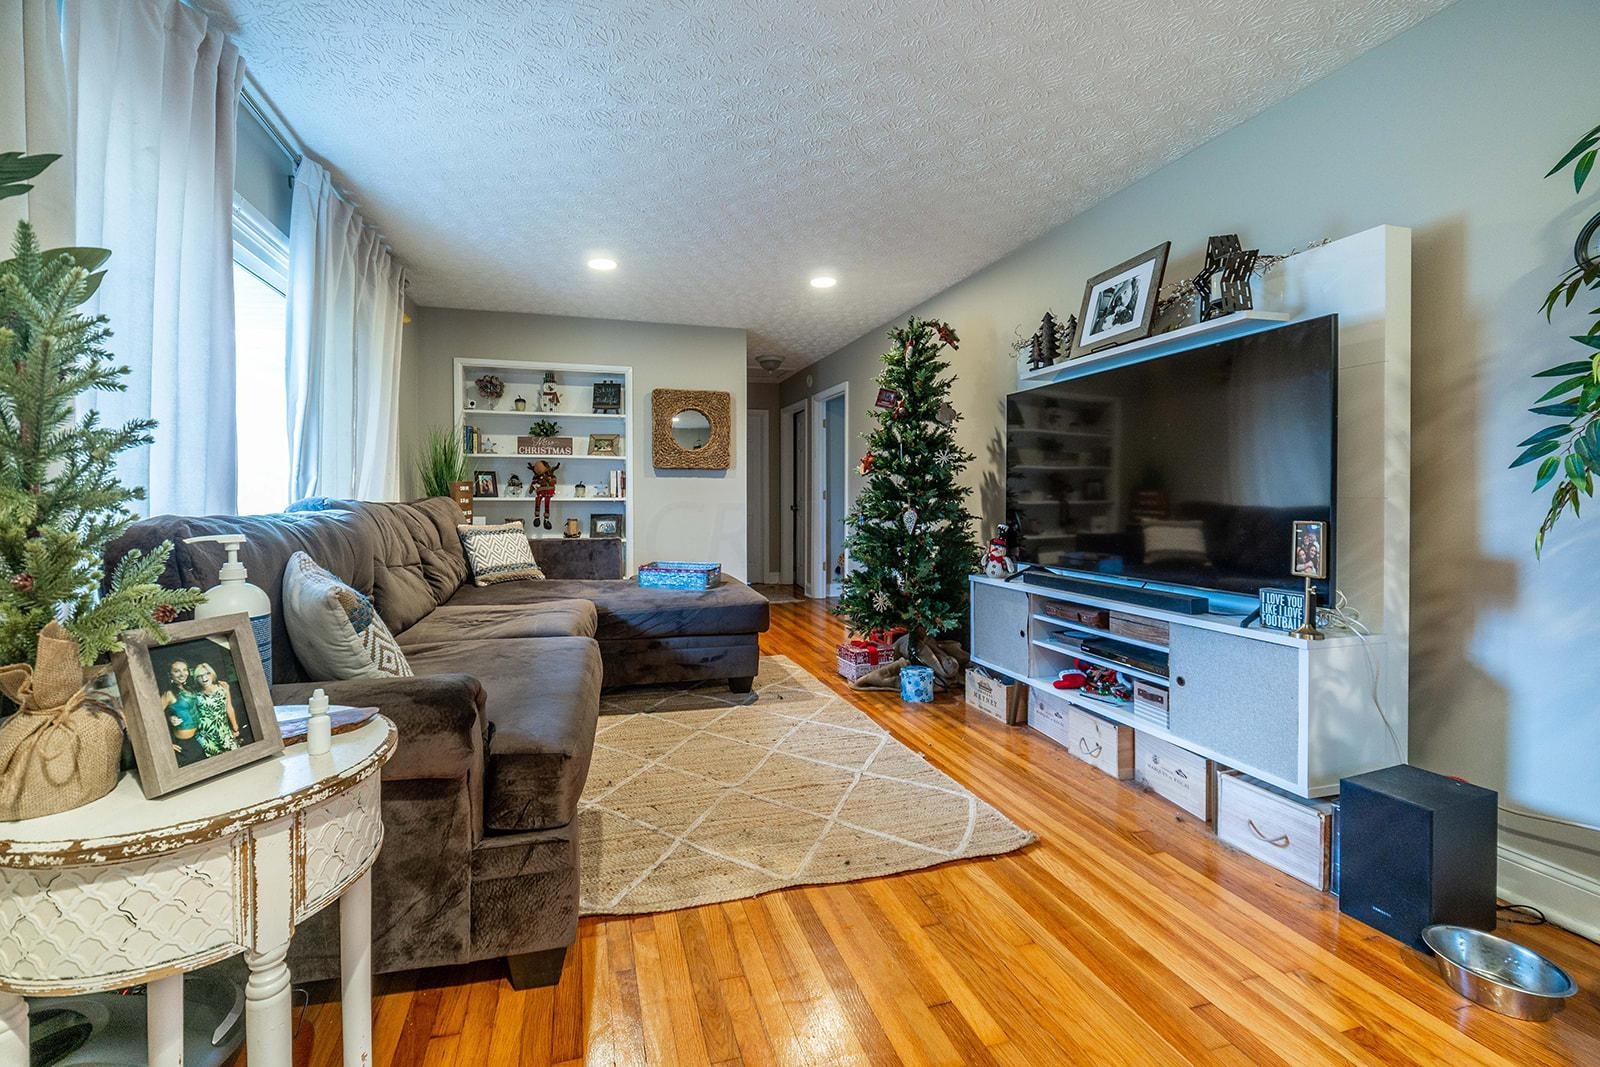 2610 Shrewsbury Road, Upper Arlington, Ohio 43221, 3 Bedrooms Bedrooms, ,2 BathroomsBathrooms,Residential,For Sale,Shrewsbury,221000753